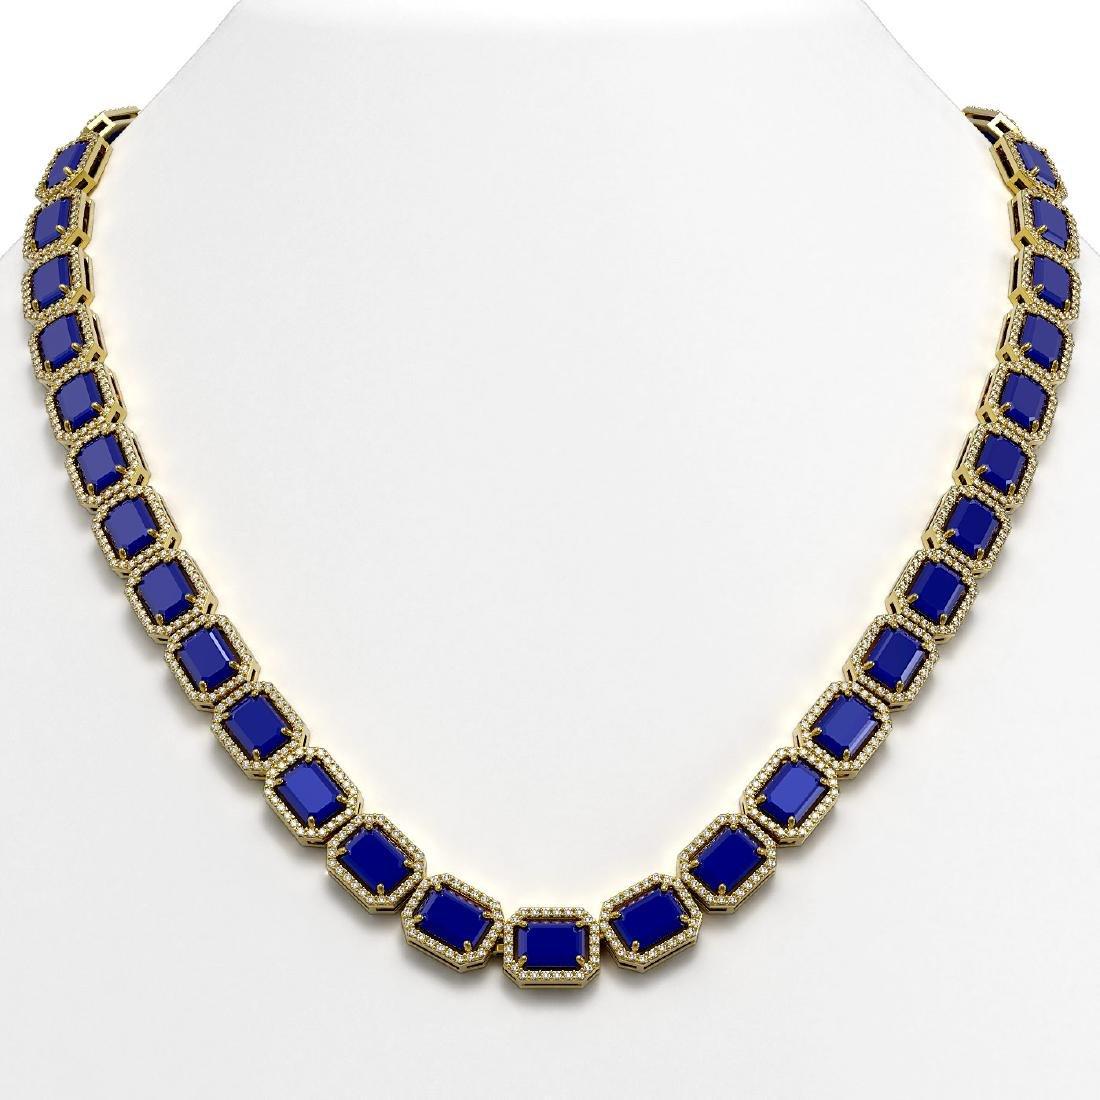 58.59 CTW Sapphire & Diamond Halo Necklace 10K Yellow